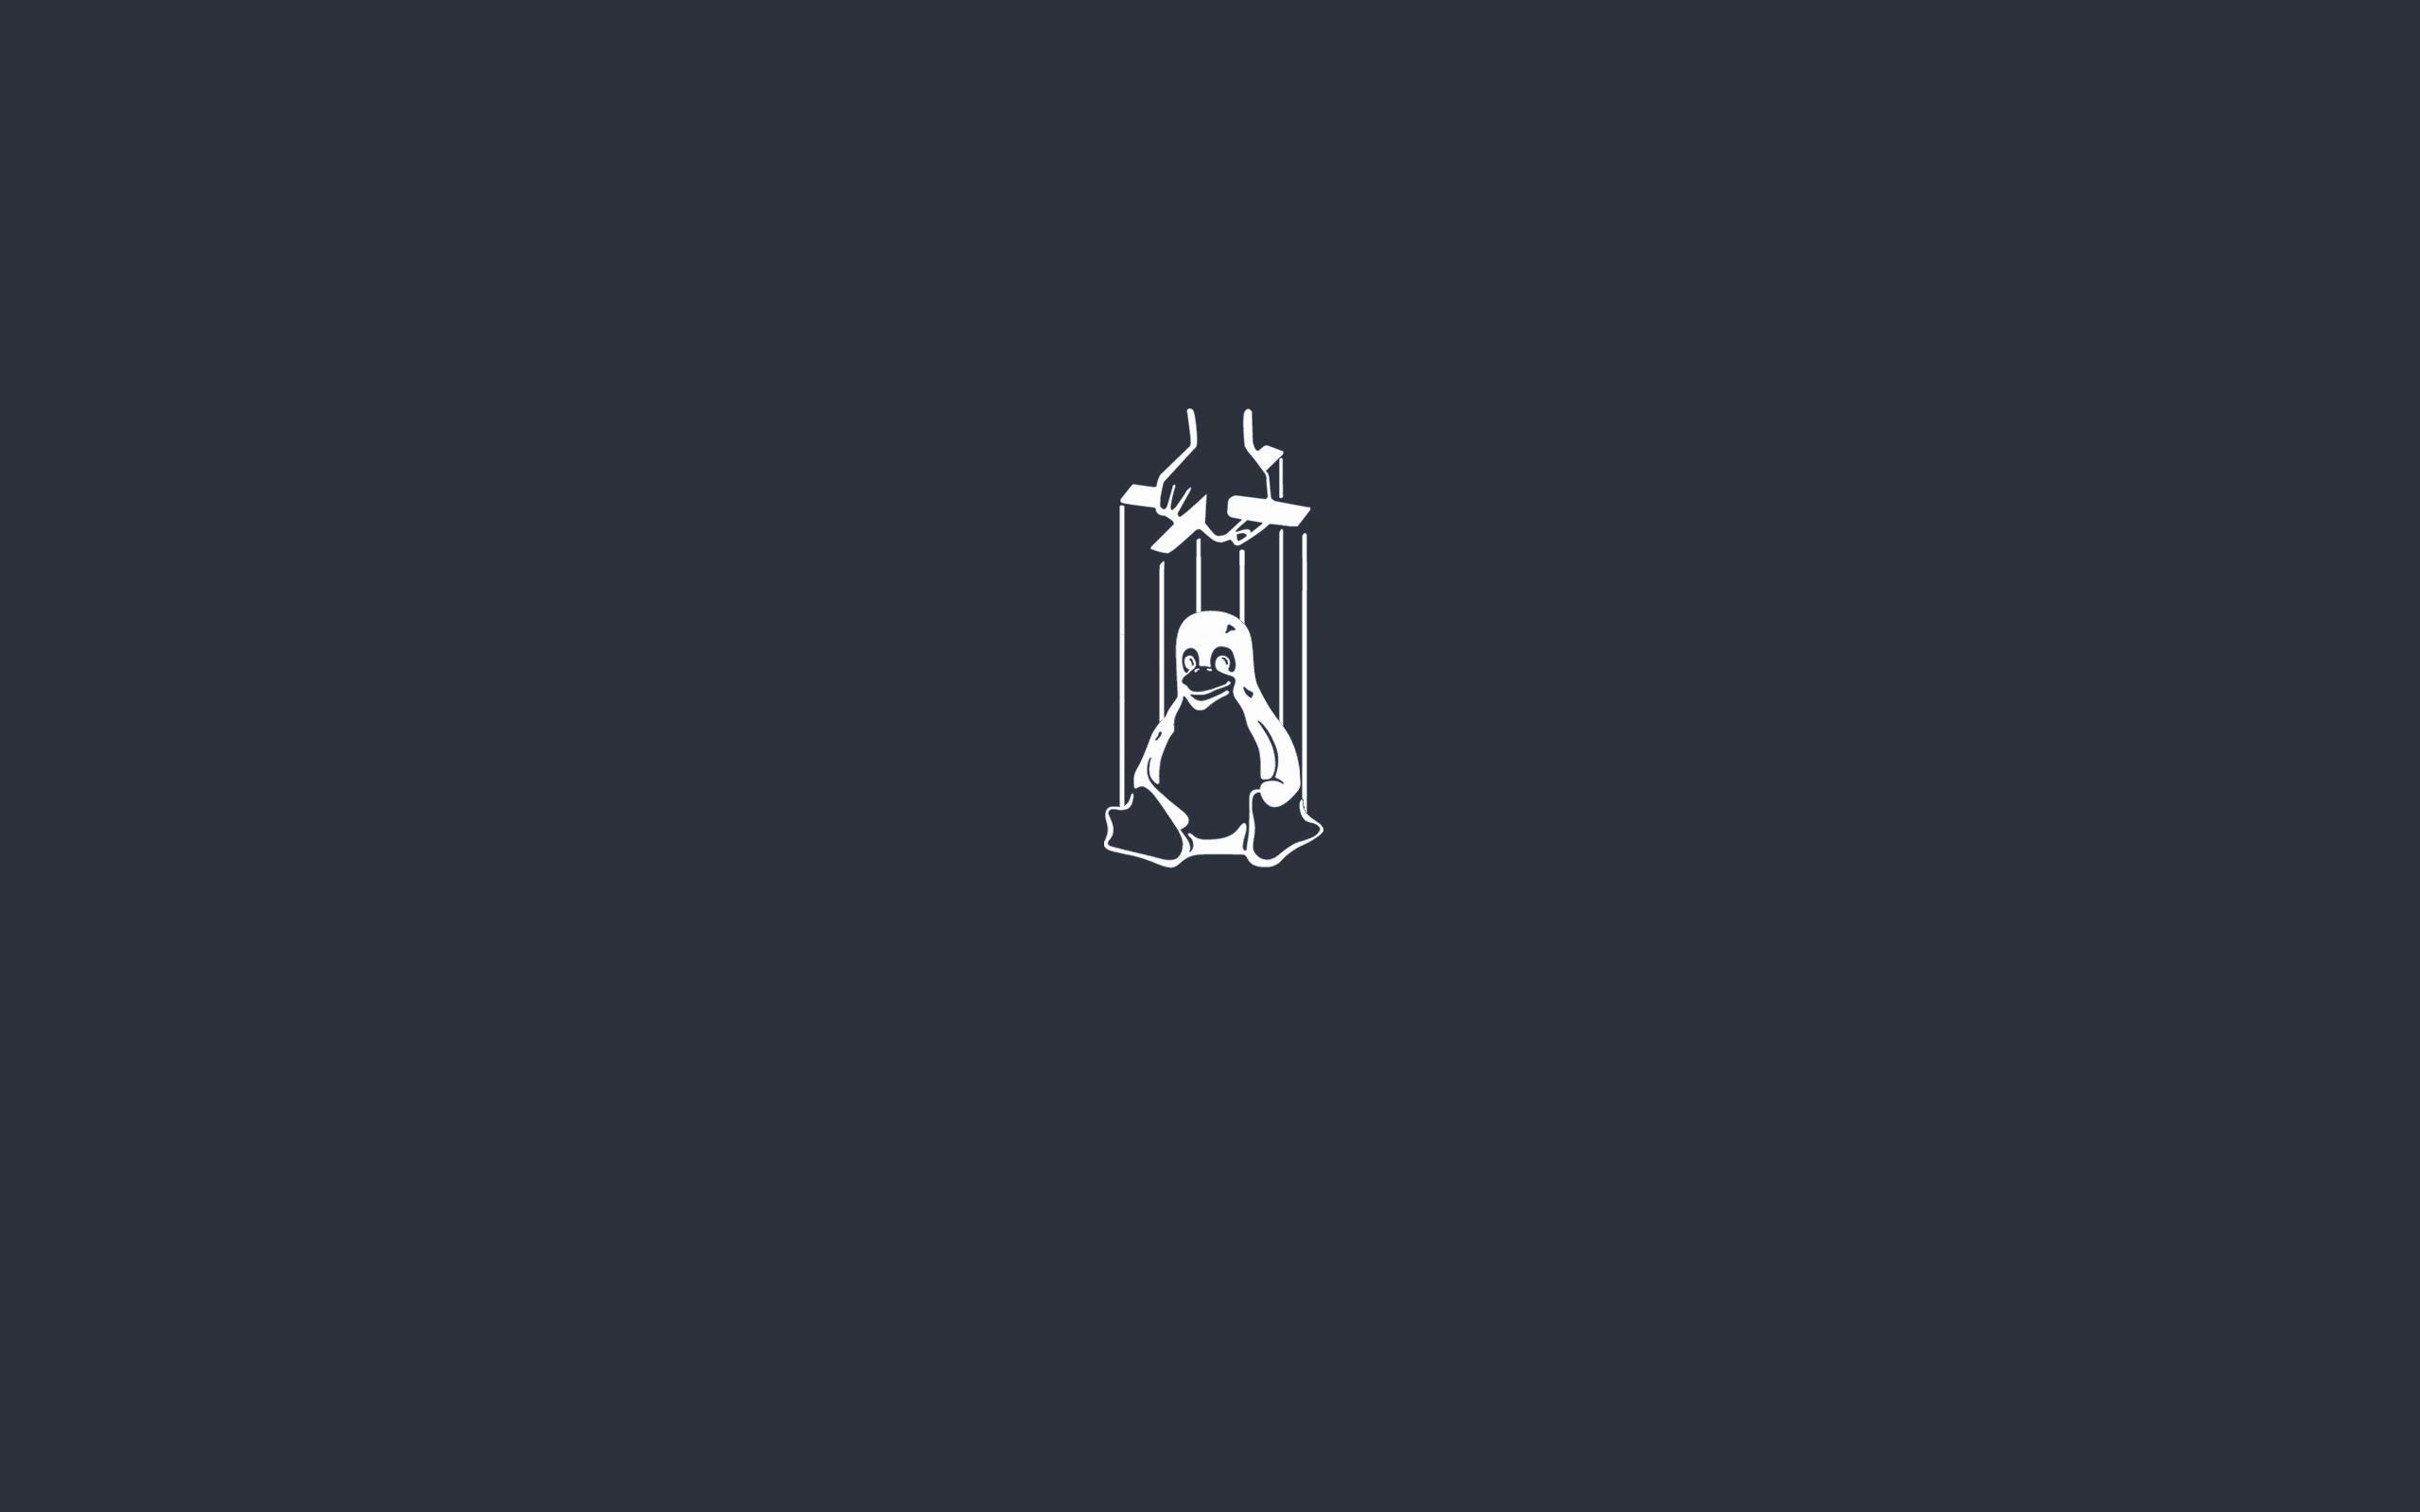 General 2560x1600 minimalism Linux simple background